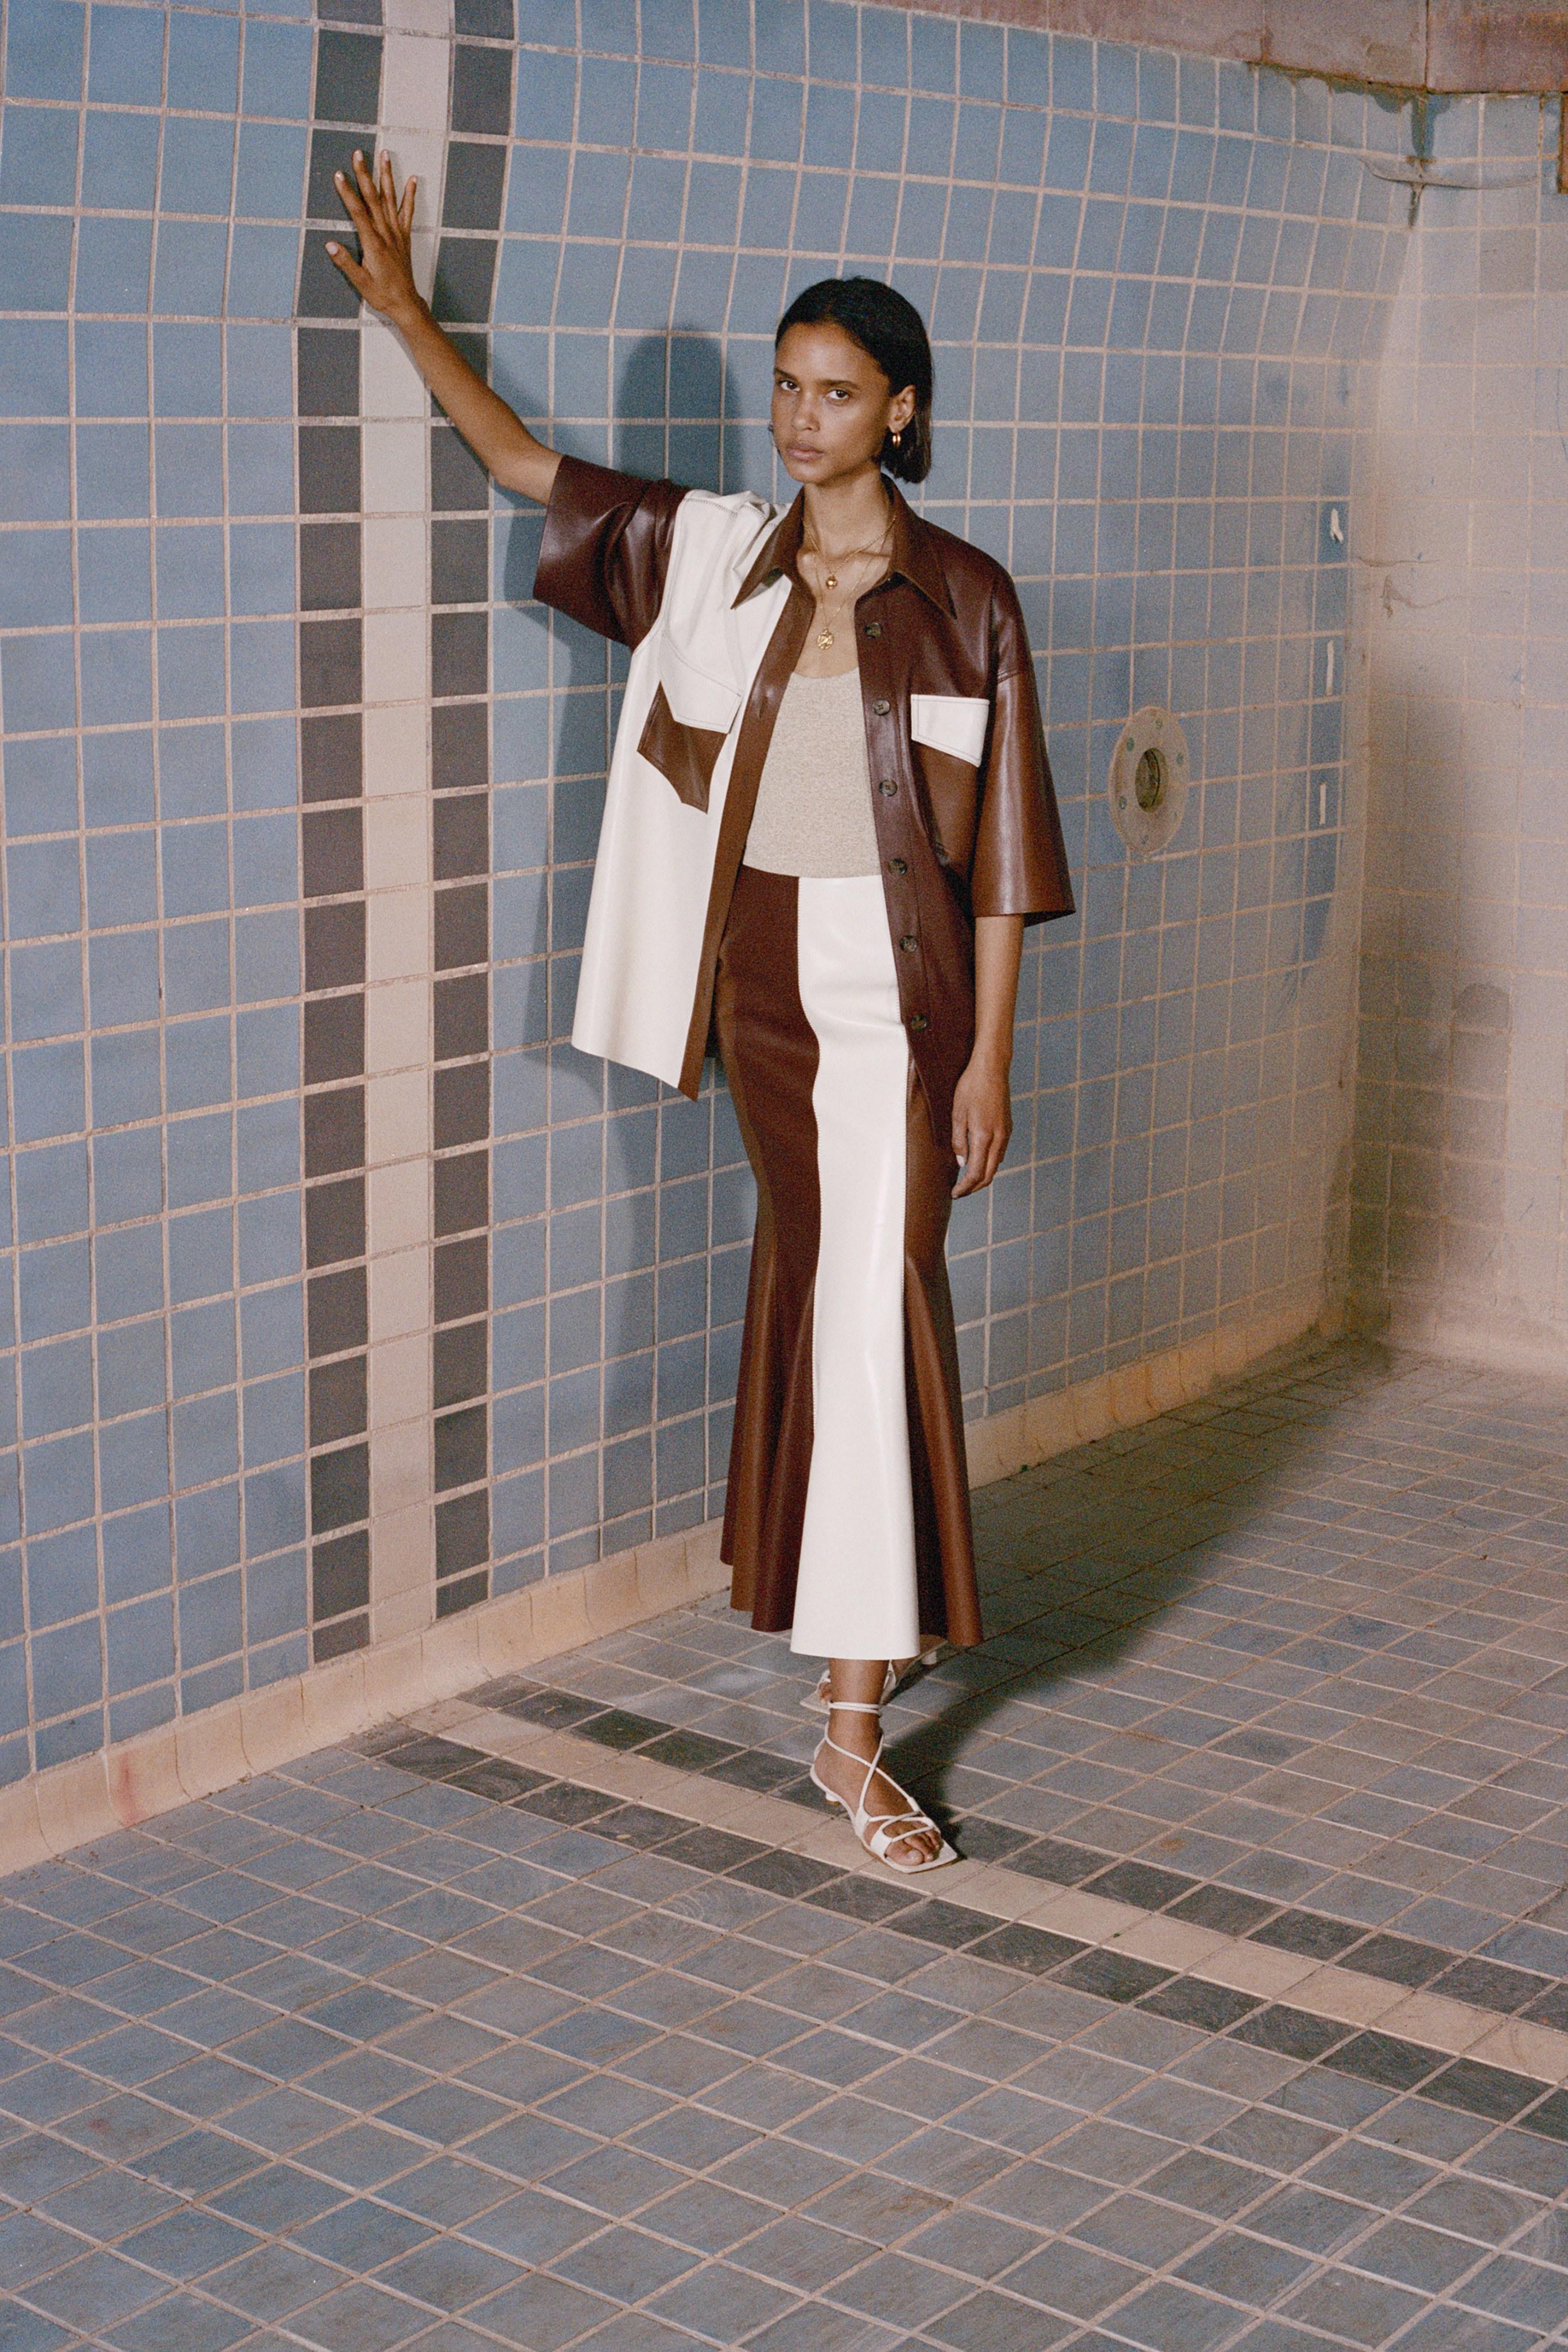 Савхин пиджак, макси юбка болон бусад дурсамж сэргээсэн 2020 оны ретро трендүүд (фото 6)